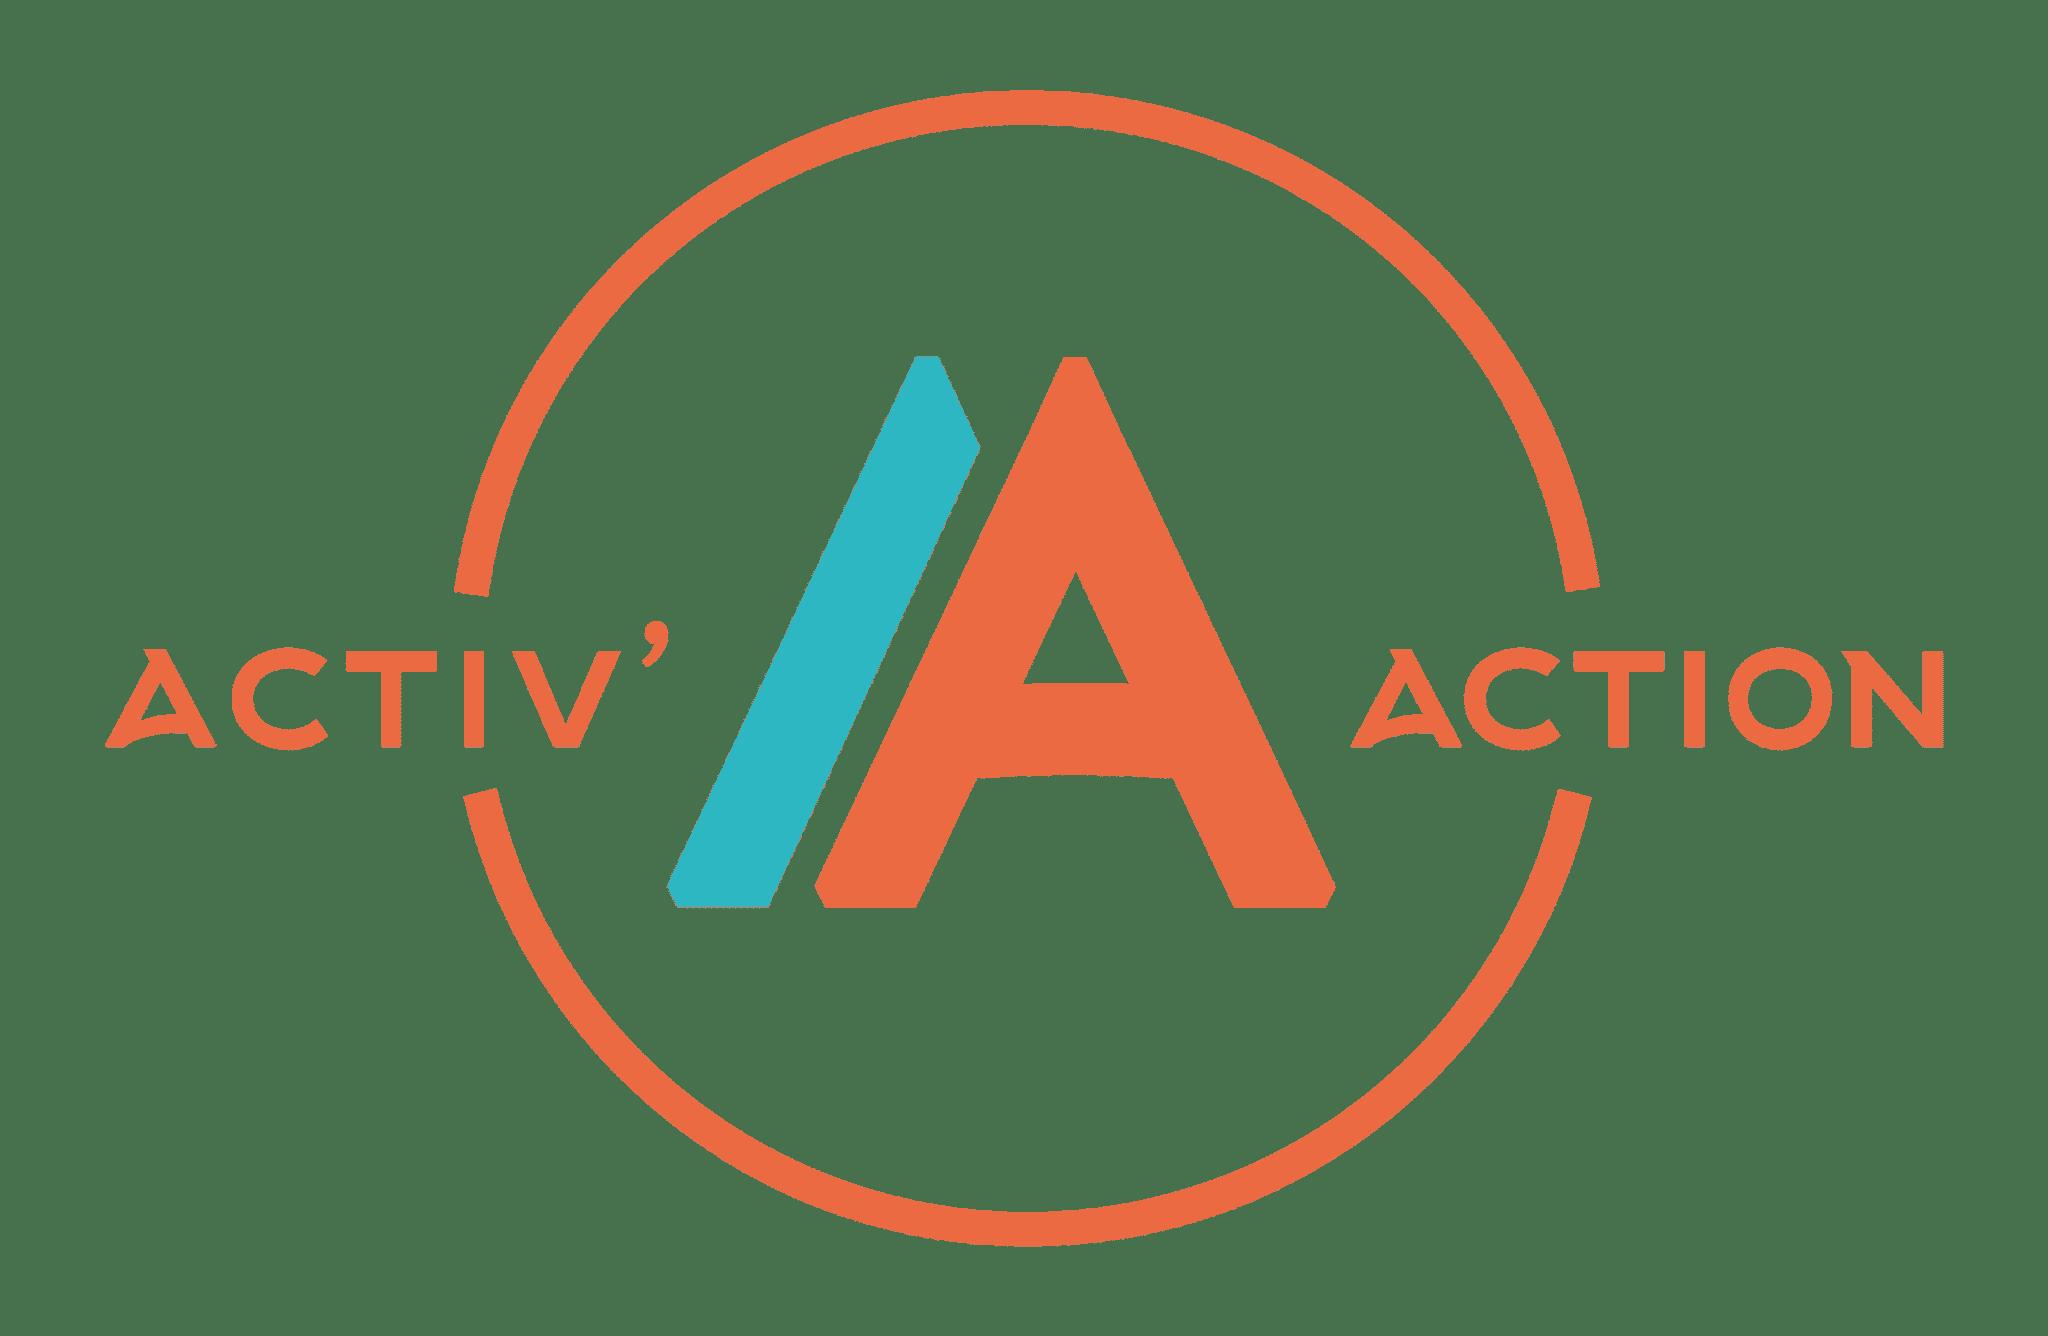 activaction-01